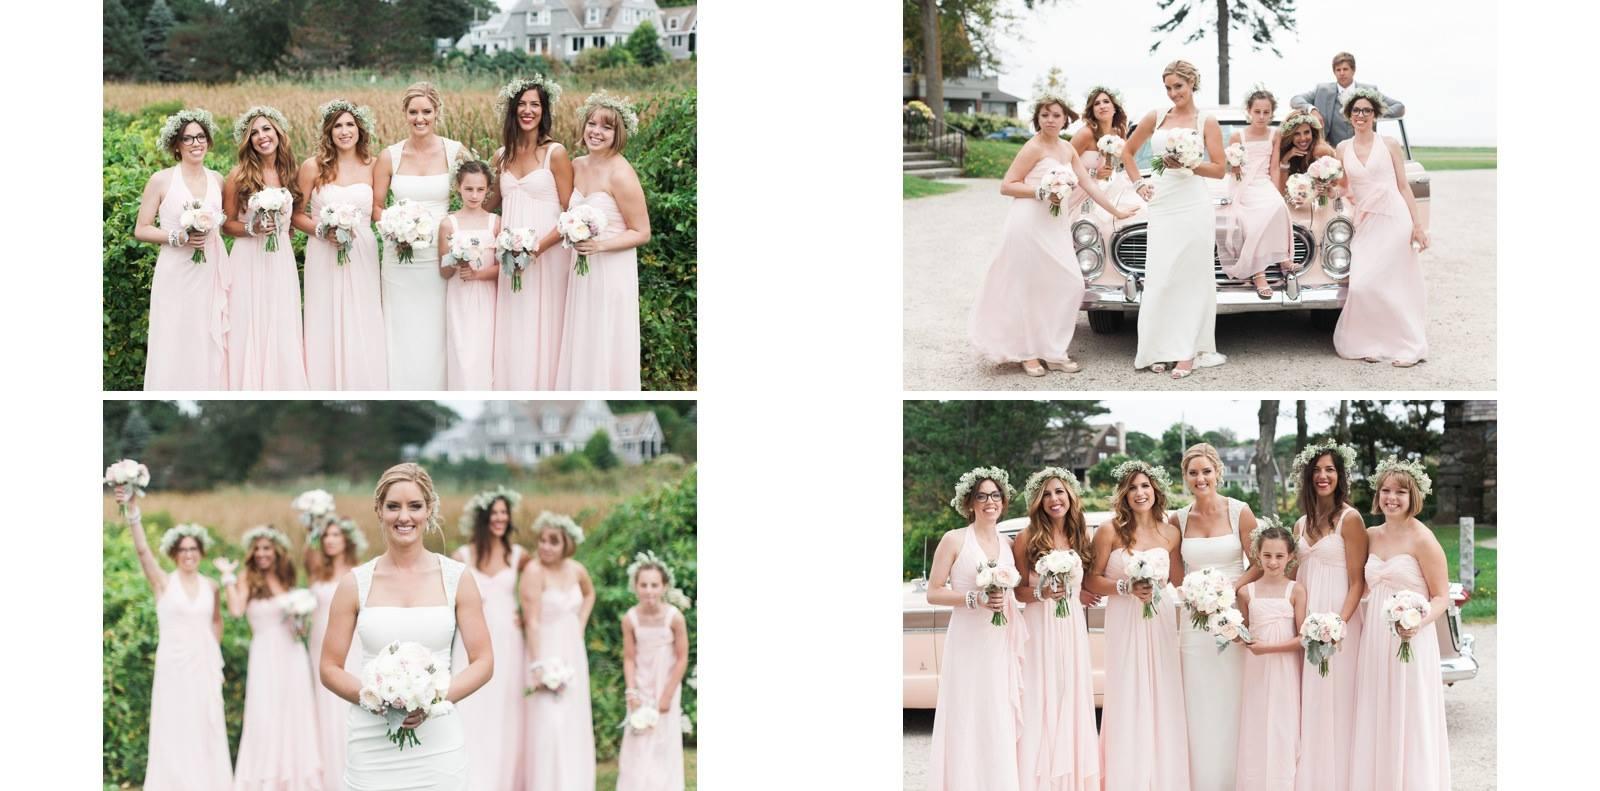 Bridesmaids, wedding